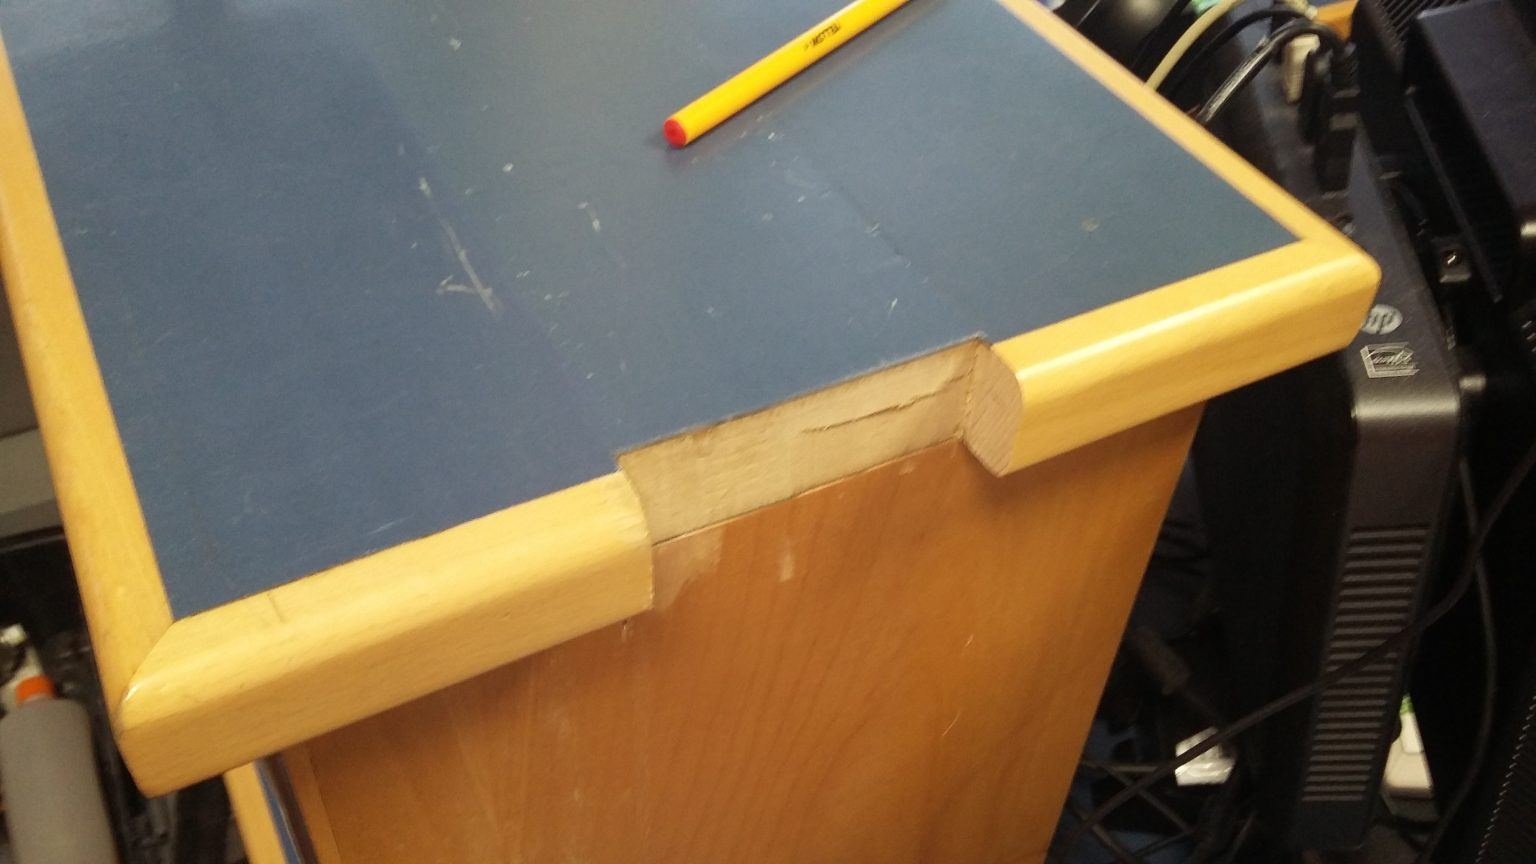 reception counter repairs and refurbishments  namco refurbs